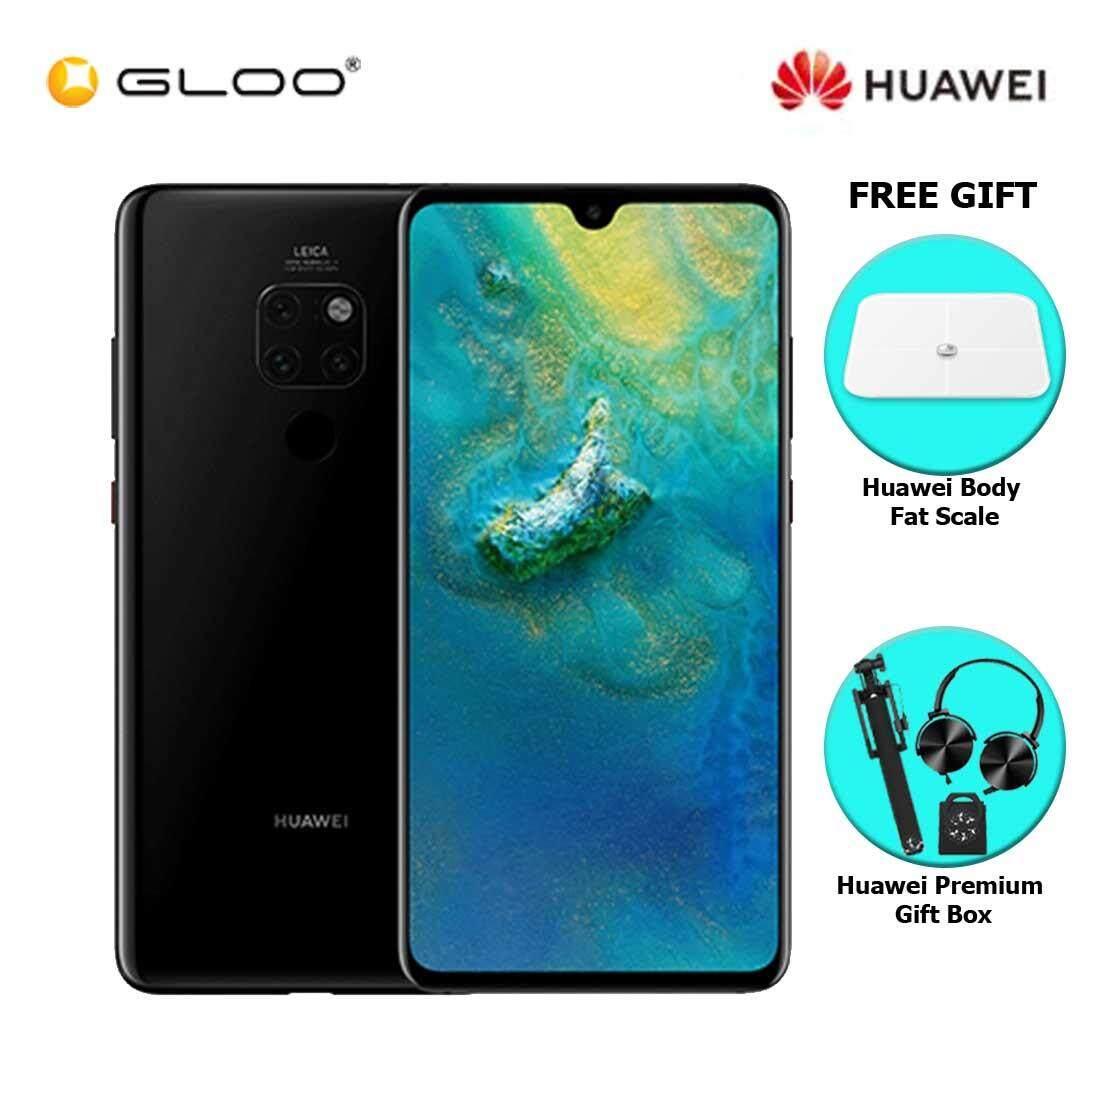 Huawei Mate 20 6GB+128GB Black + FREE Huawei Body Fat Scale 6901443198375,Premium Gift Box (Headset/Selfie Stick/iRing)